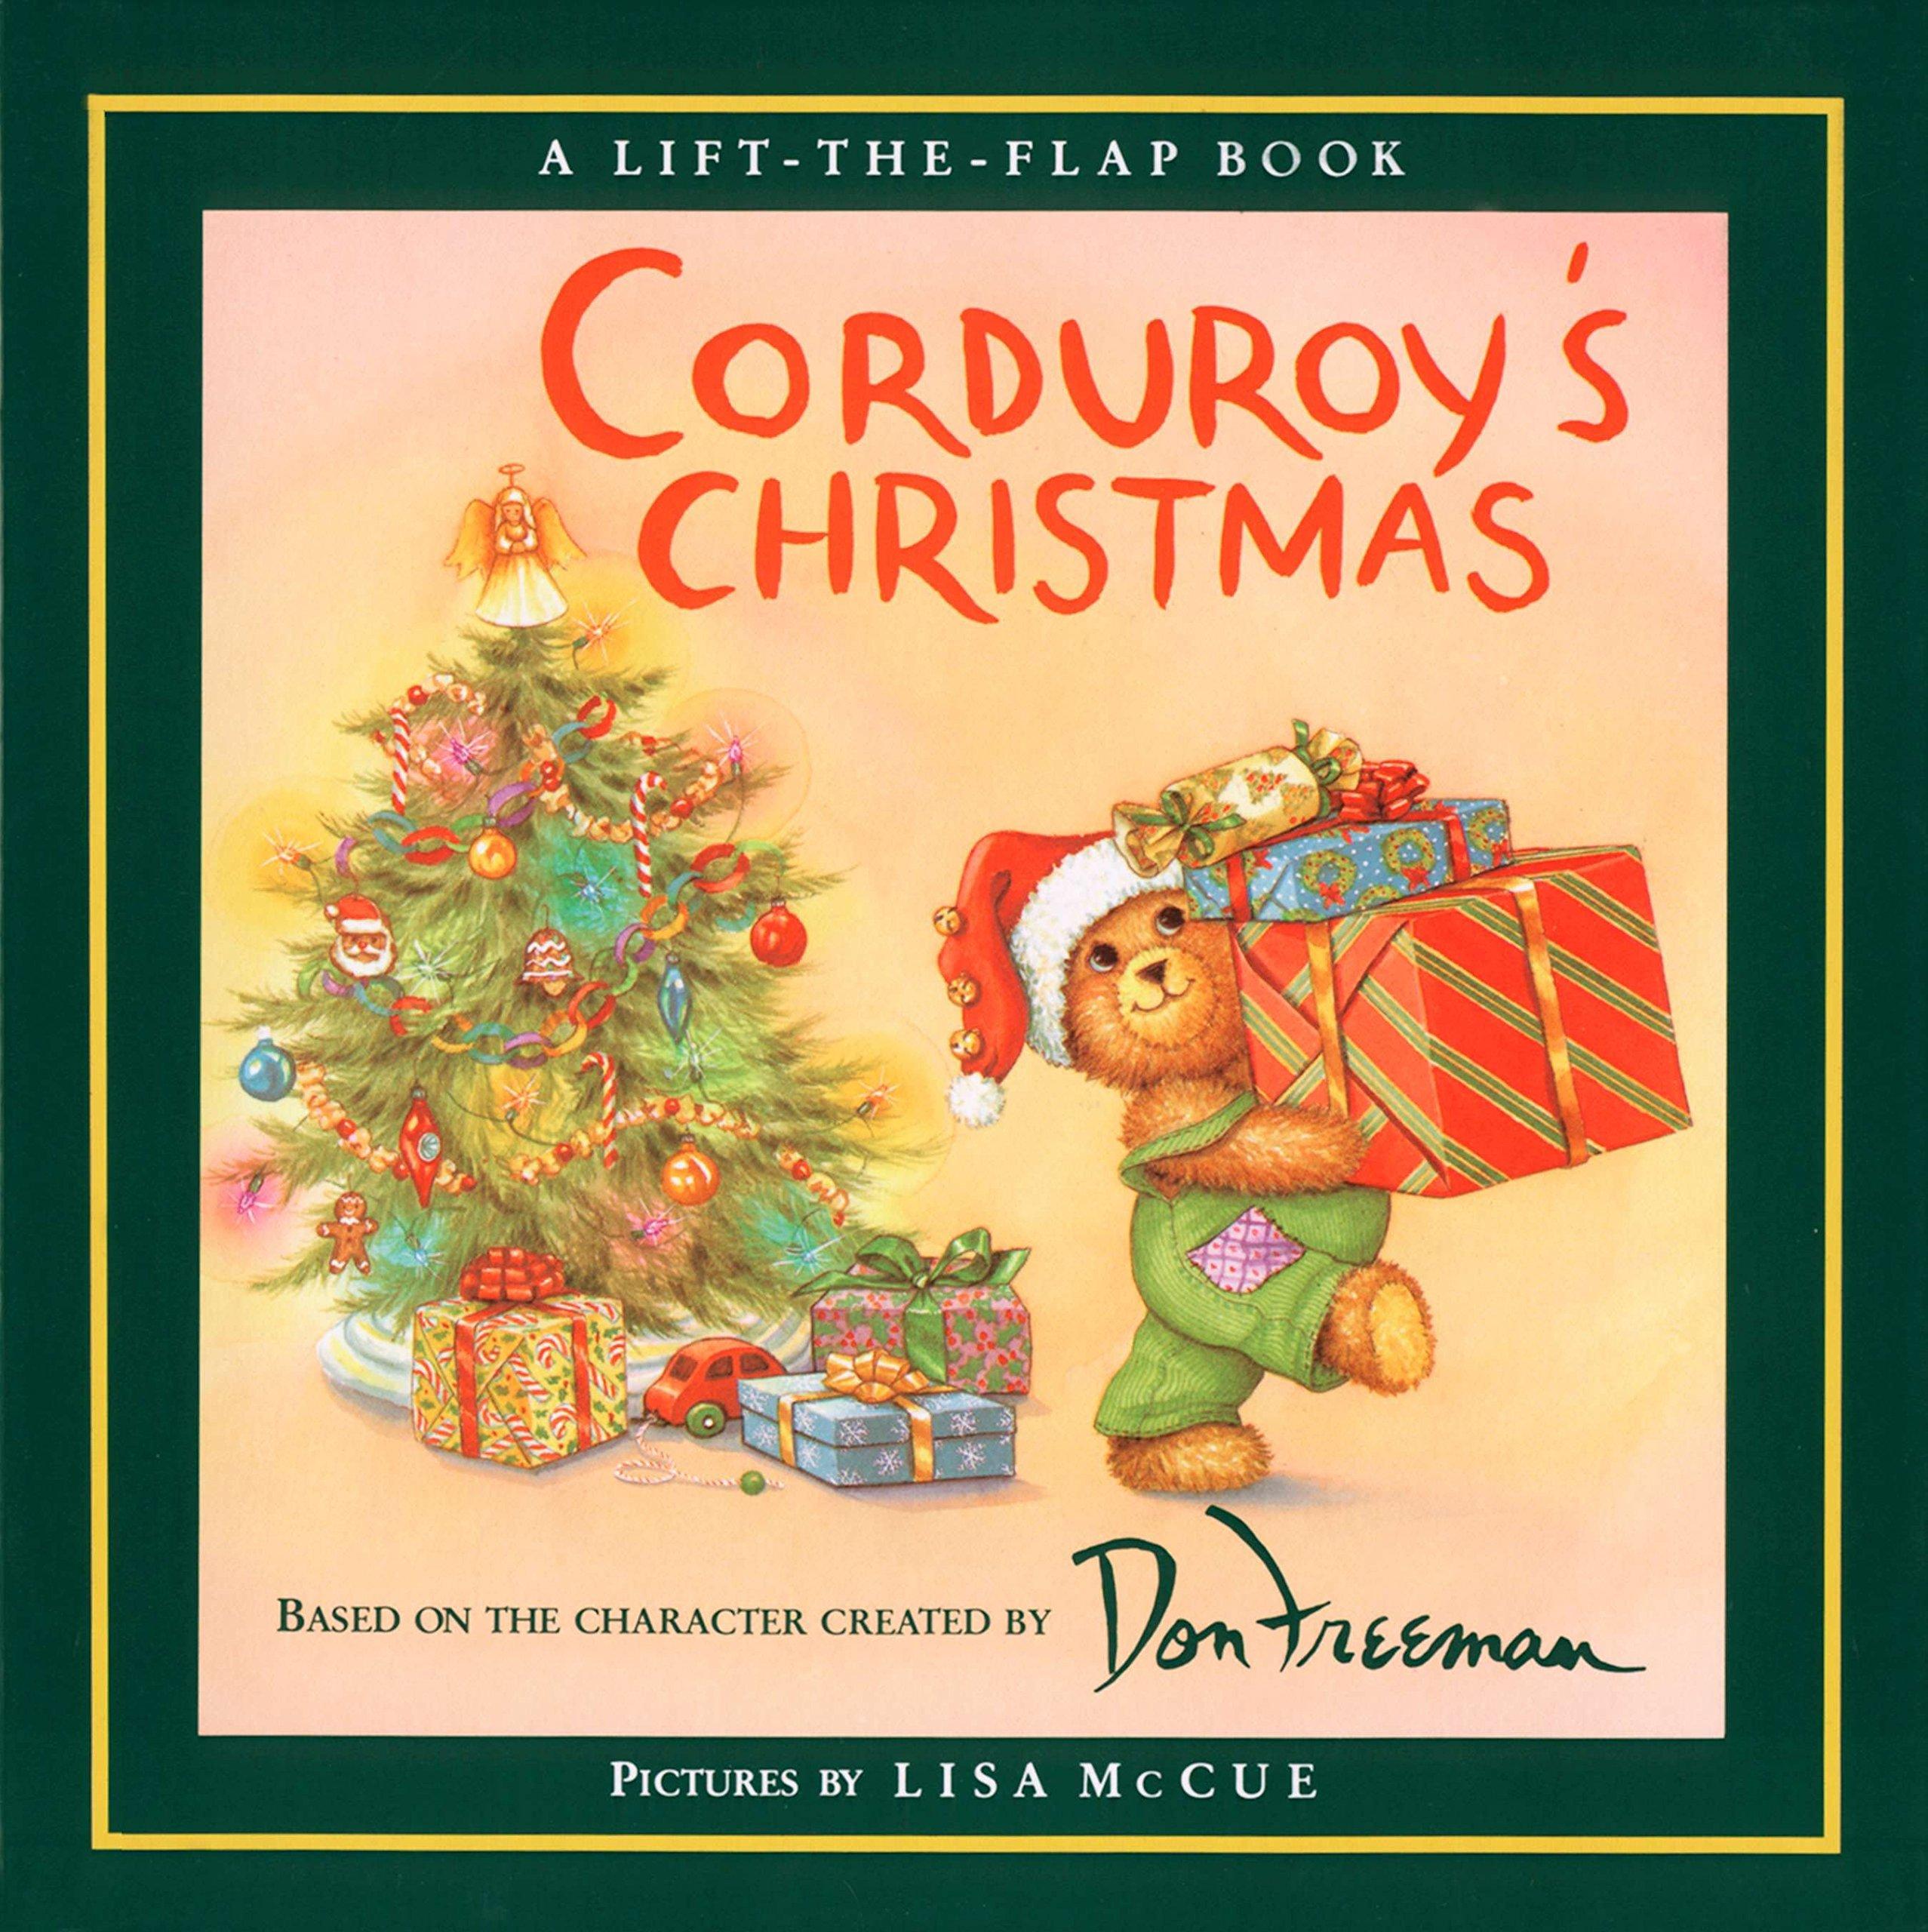 corduroys christmas don freeman bg hennessy 9780670844777 amazoncom books - When Was Christmas Created